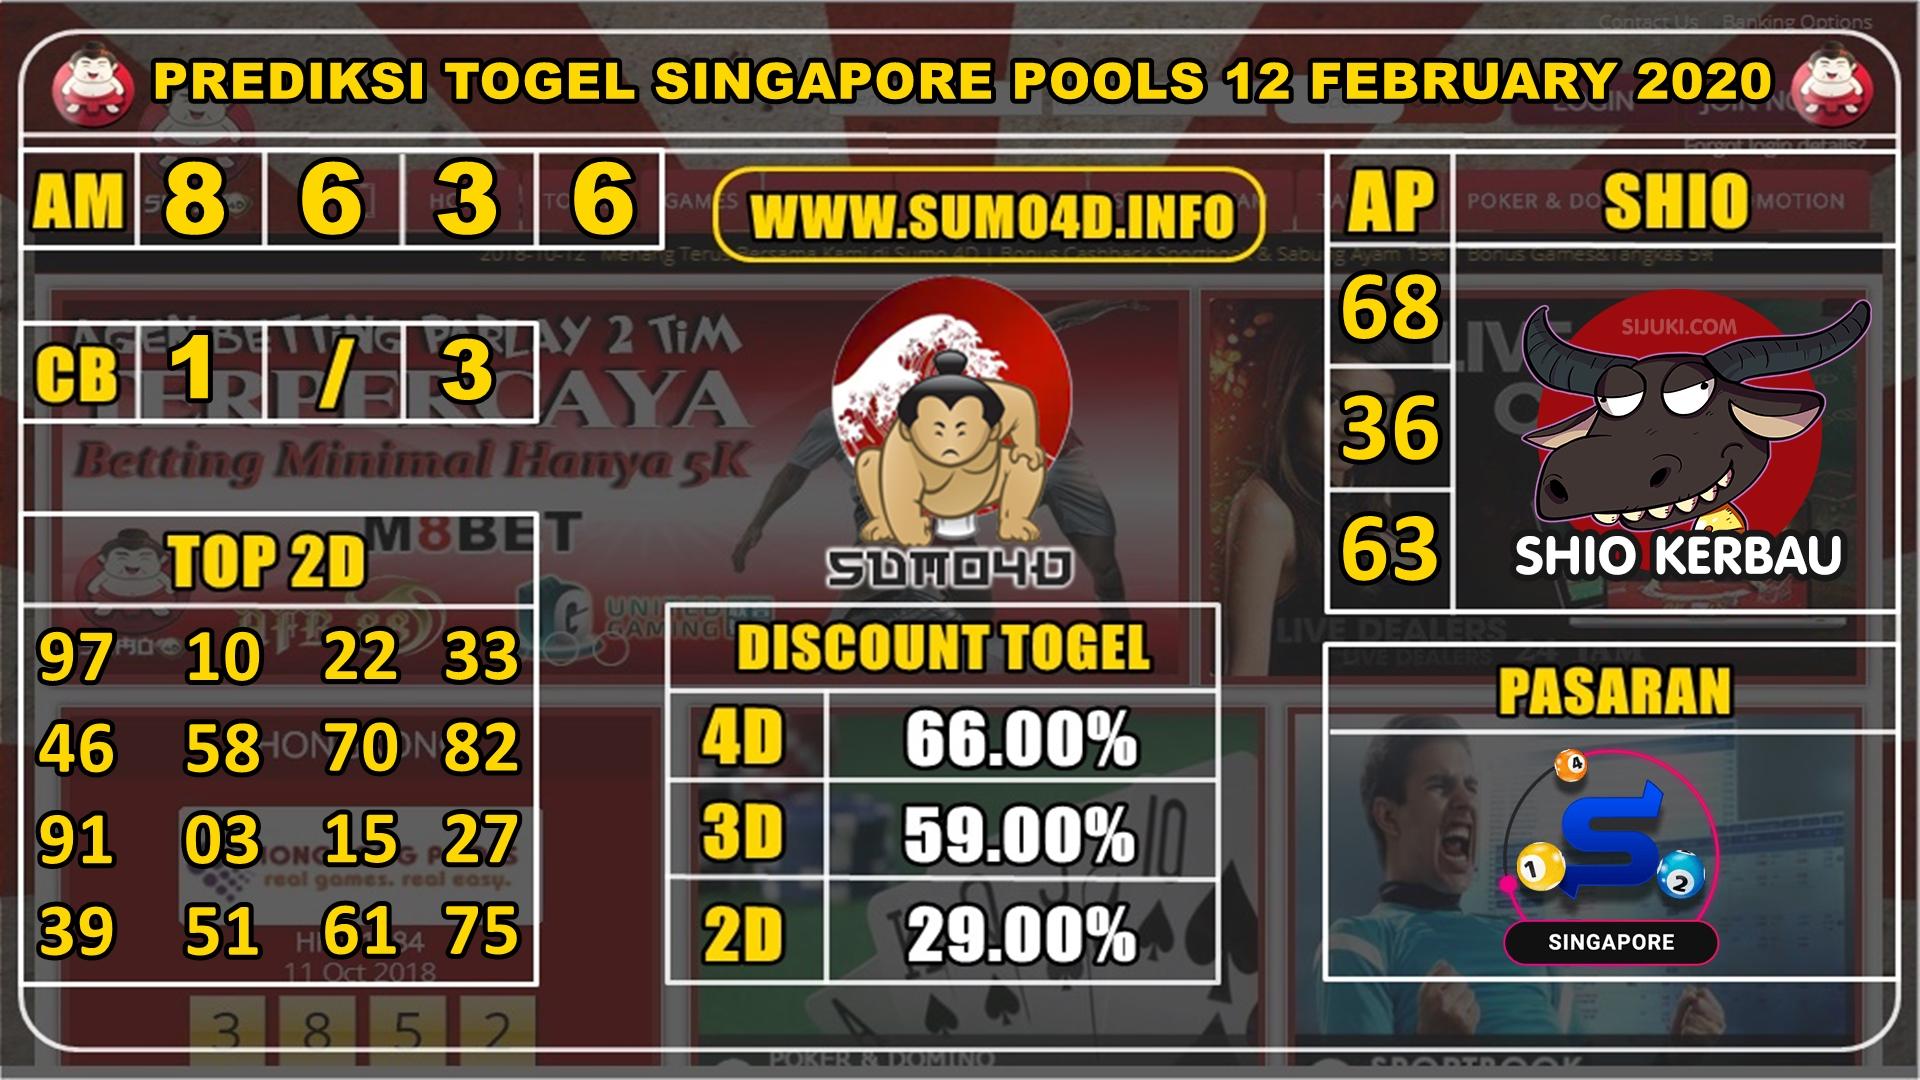 PREDIKSI TOGEL SINGAPORE POOLS 12 FEBRUARY 2020